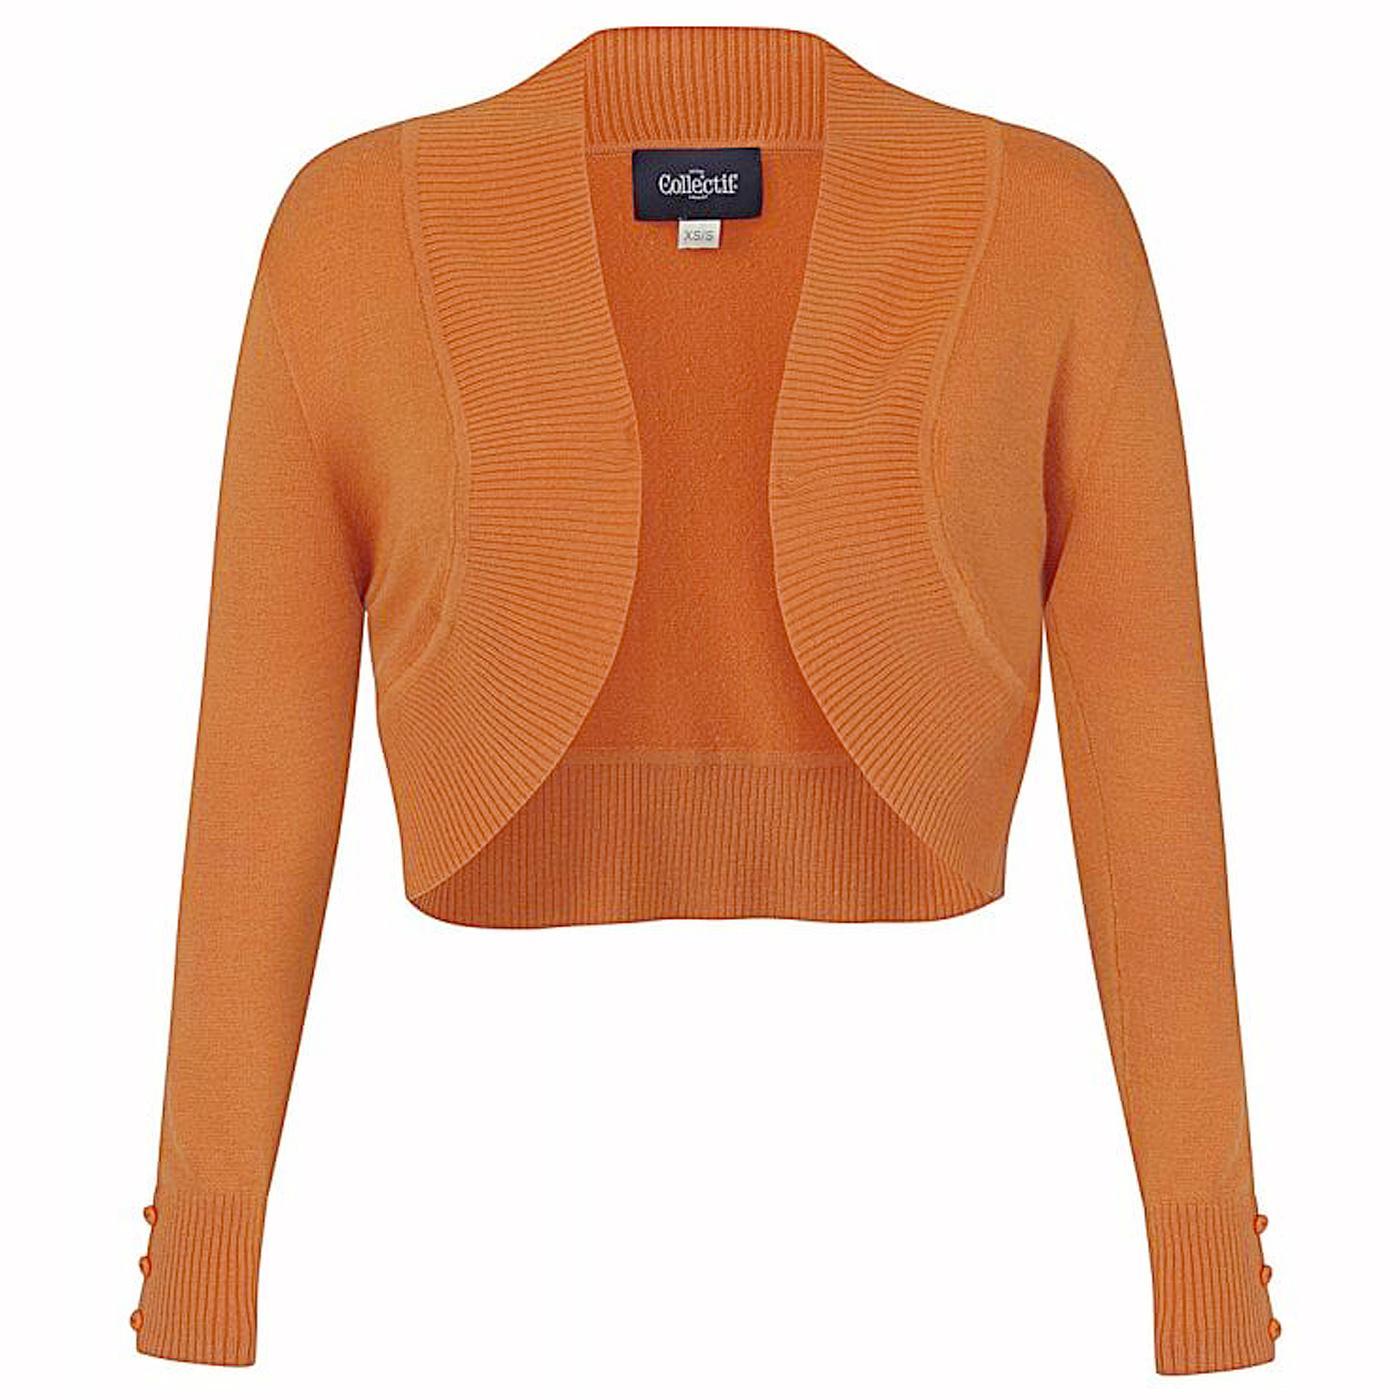 Jean COLLECTIF Vintage 50s Bolero Cardigan Orange